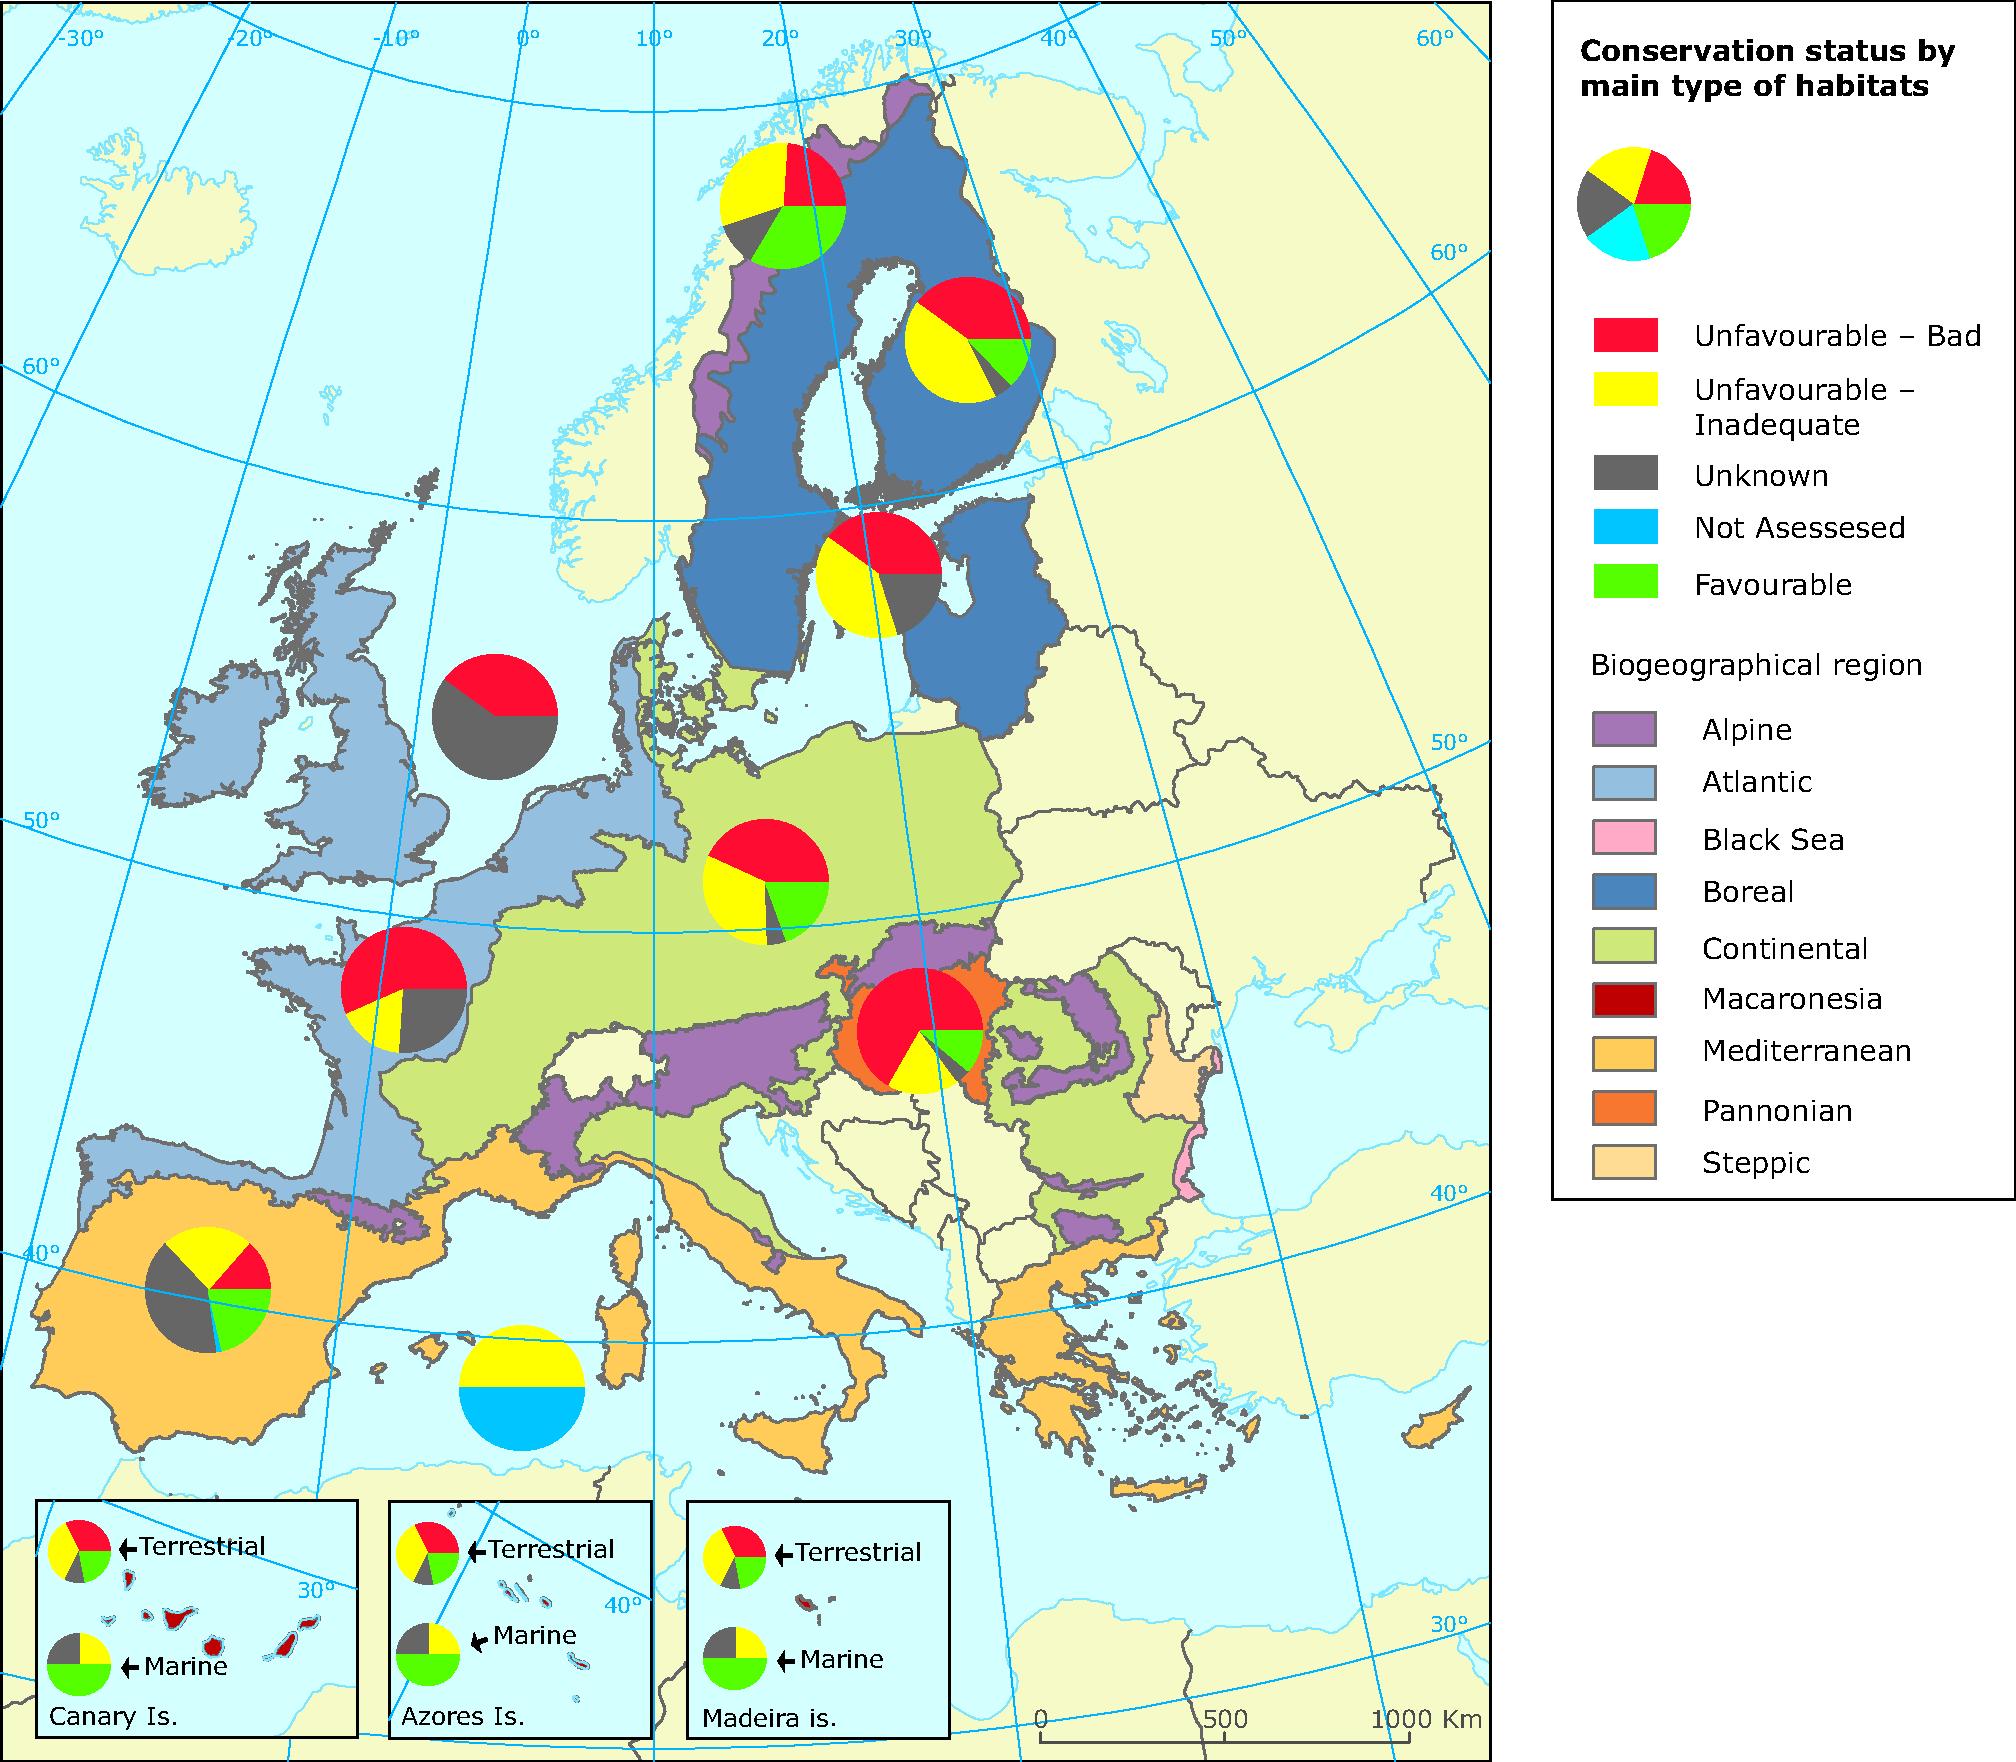 Habitats of European interest — conservation status by biogeographical region